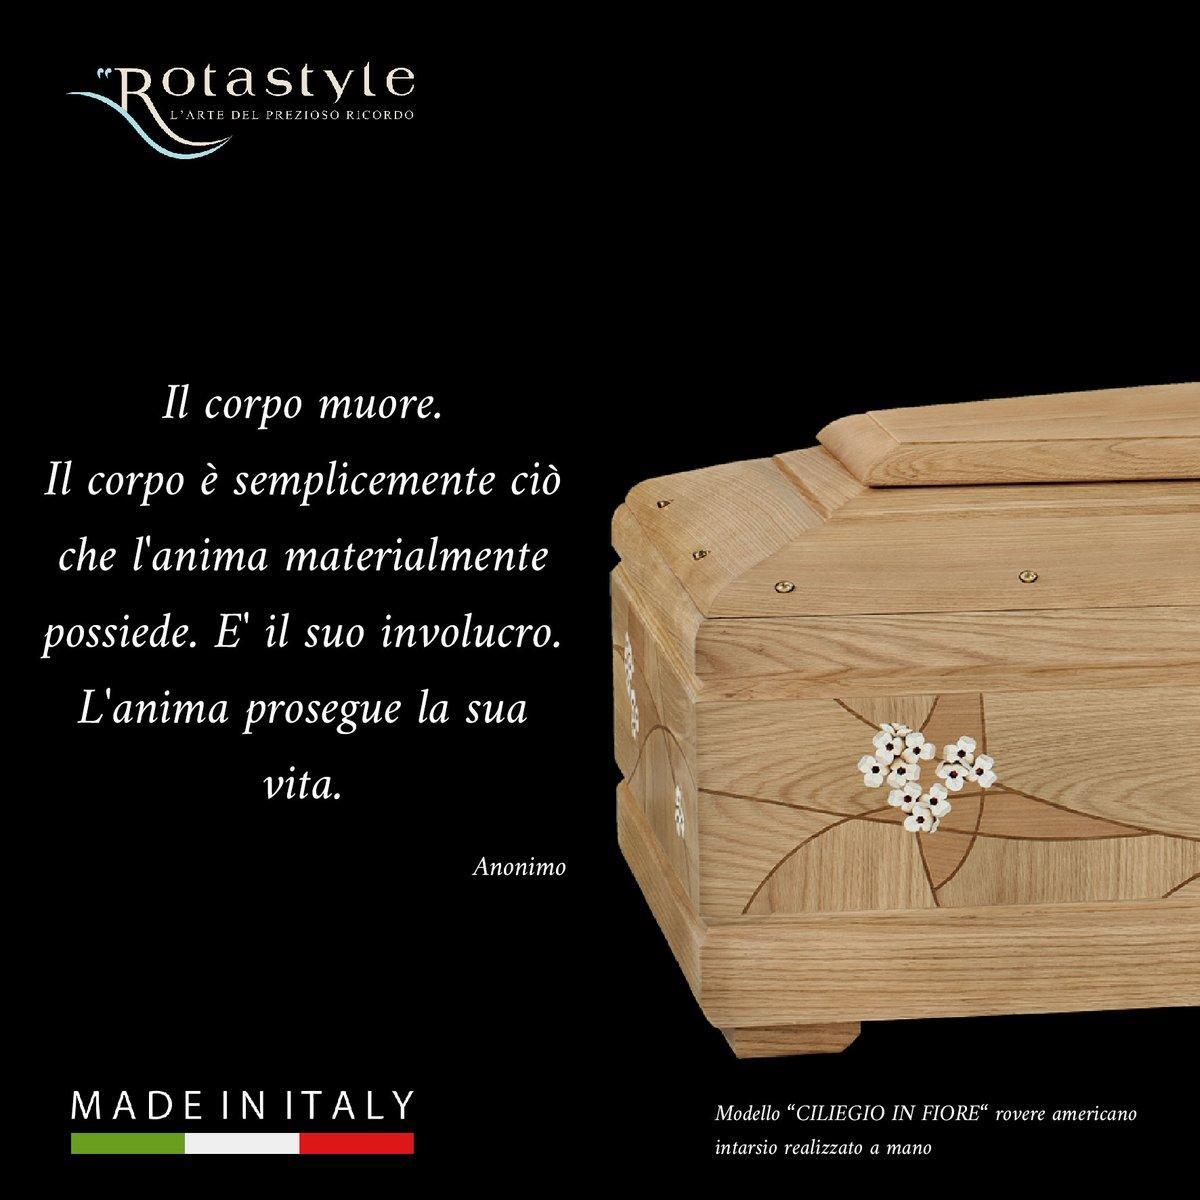 #rotastyle #forever #qualità #eleganza #poesia #madeinItaly #fattoamano #artigianale #unique #originale #solodanoi #vogliounarotastyle #bergamo #caskets #intarsio #italianstyle #coffins #quality #details #classe #funeralboutique #rovere #luxury #inlay #handmade  #amore https://t.co/EkiAlGPvYX